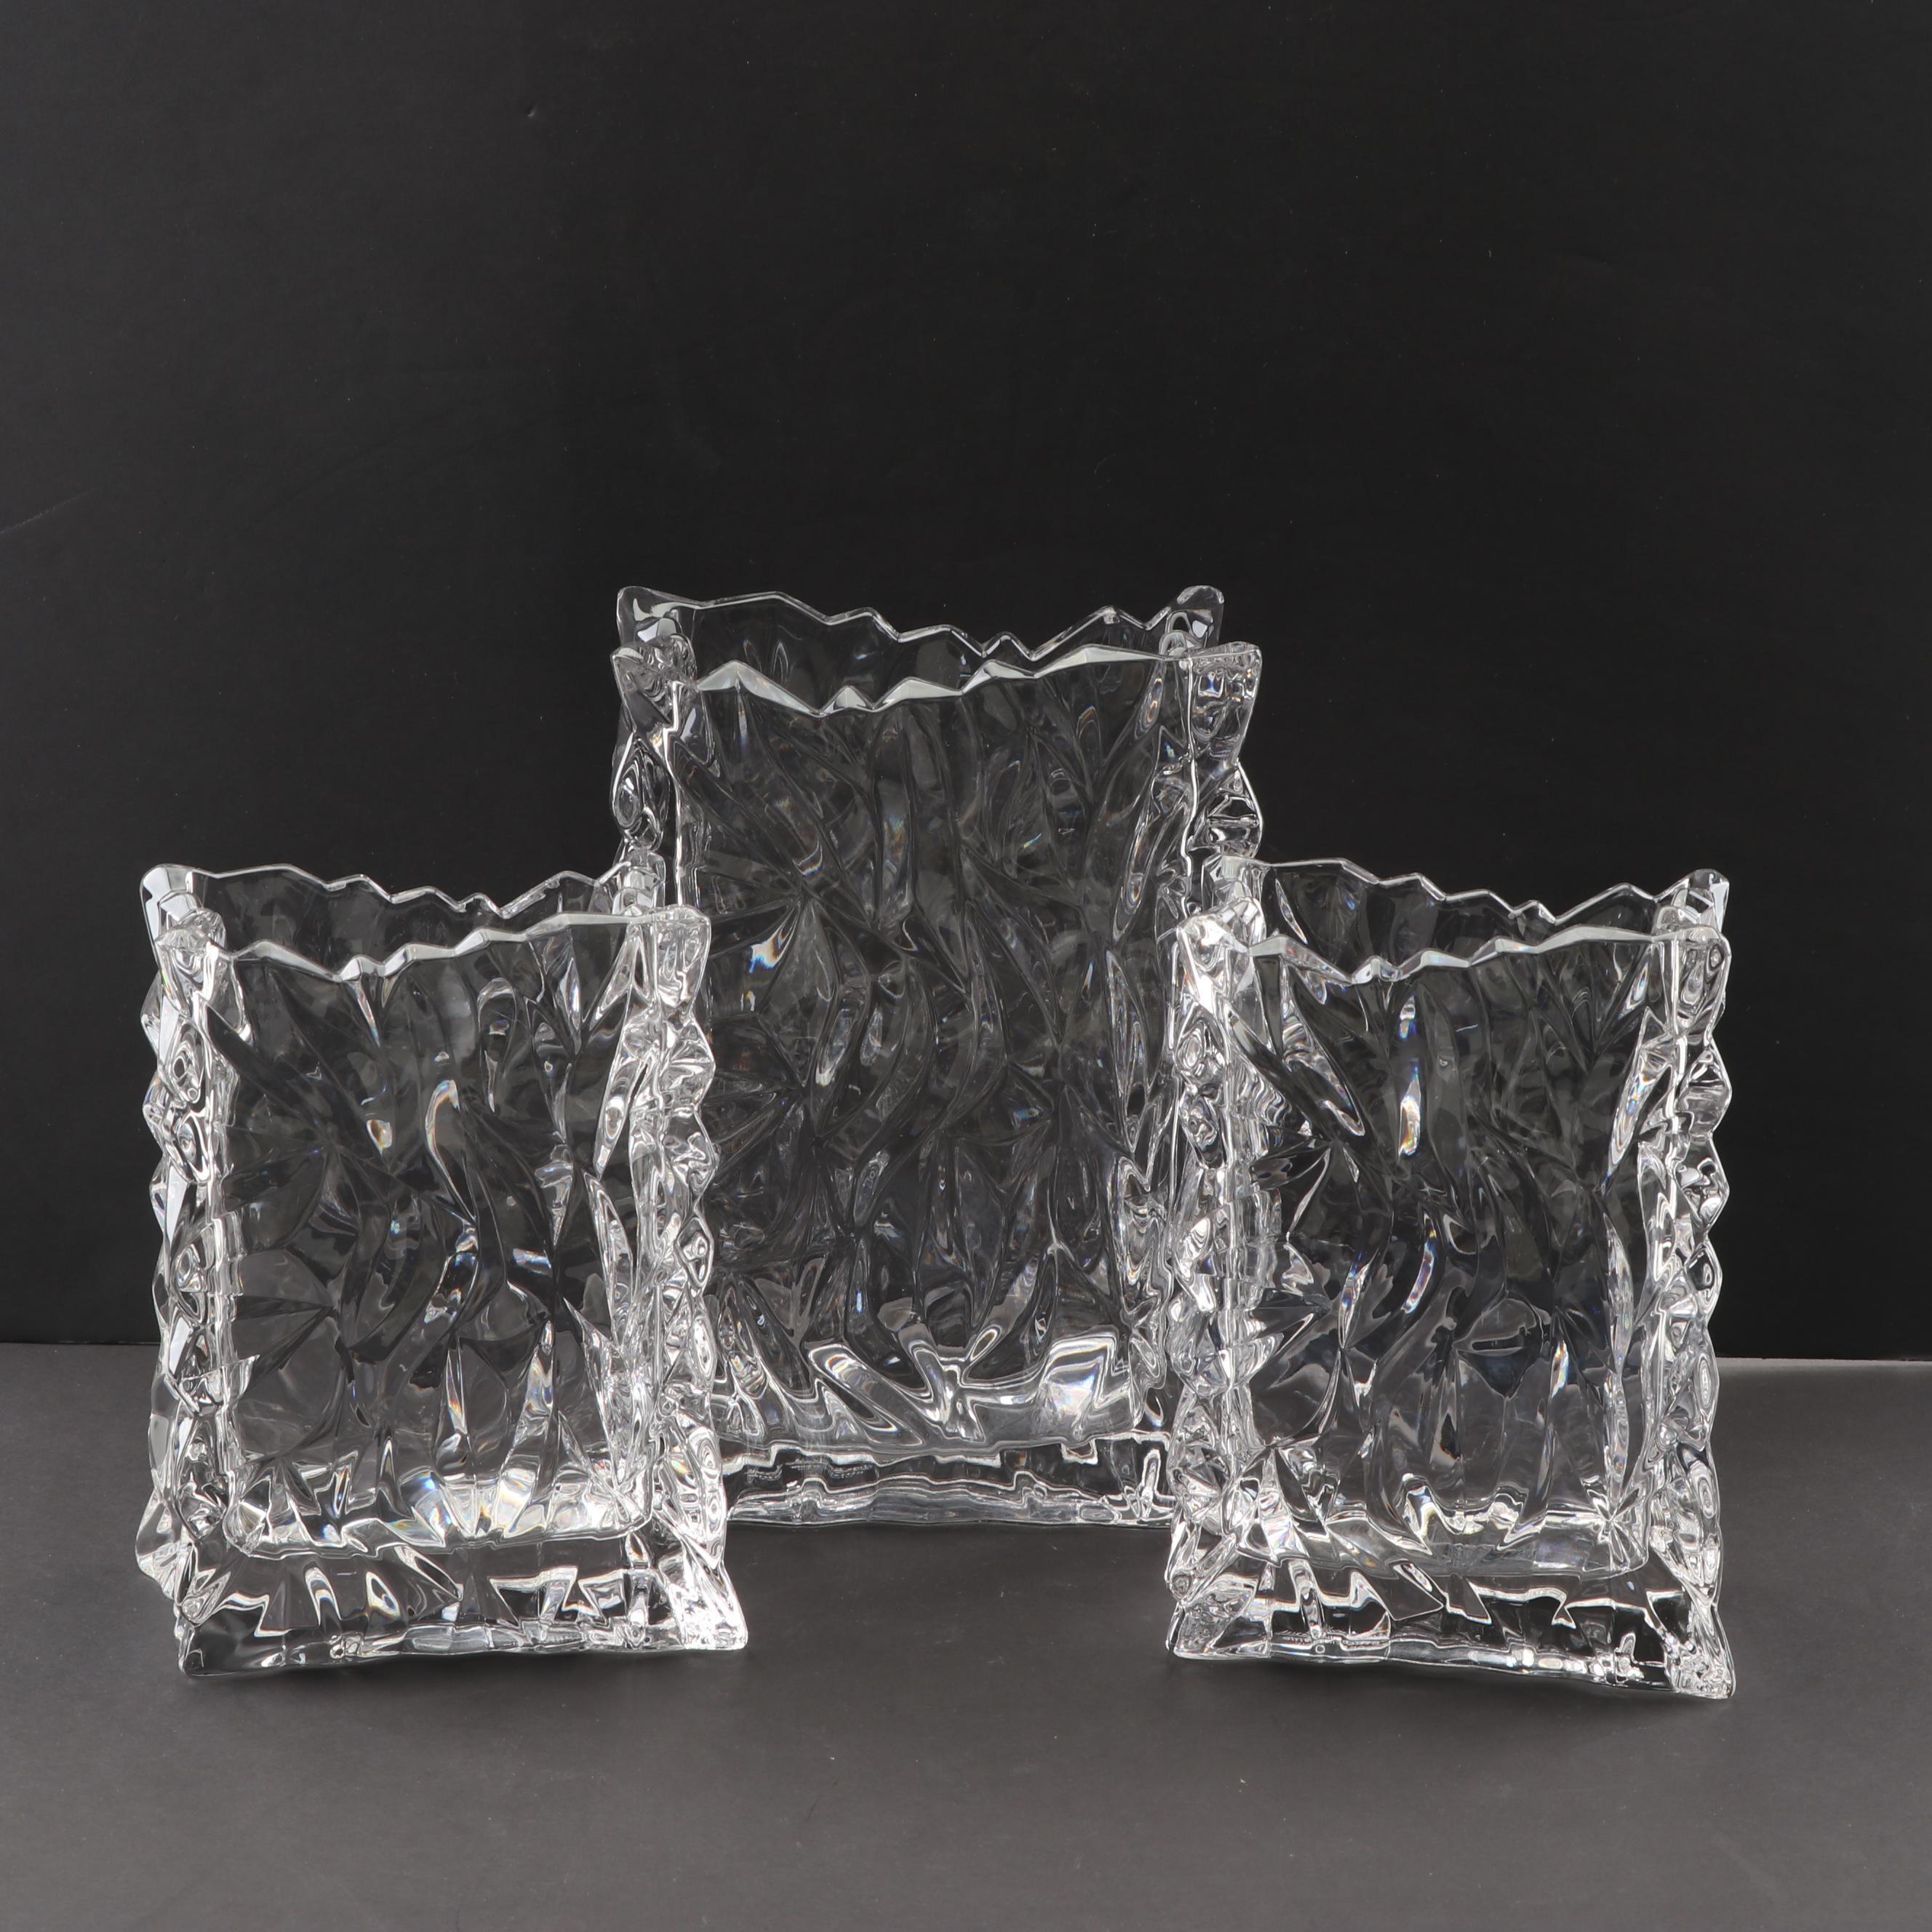 Mid Century Modern Tapio Wirkkala for Rosenthal Ice Crystal Sack Vases